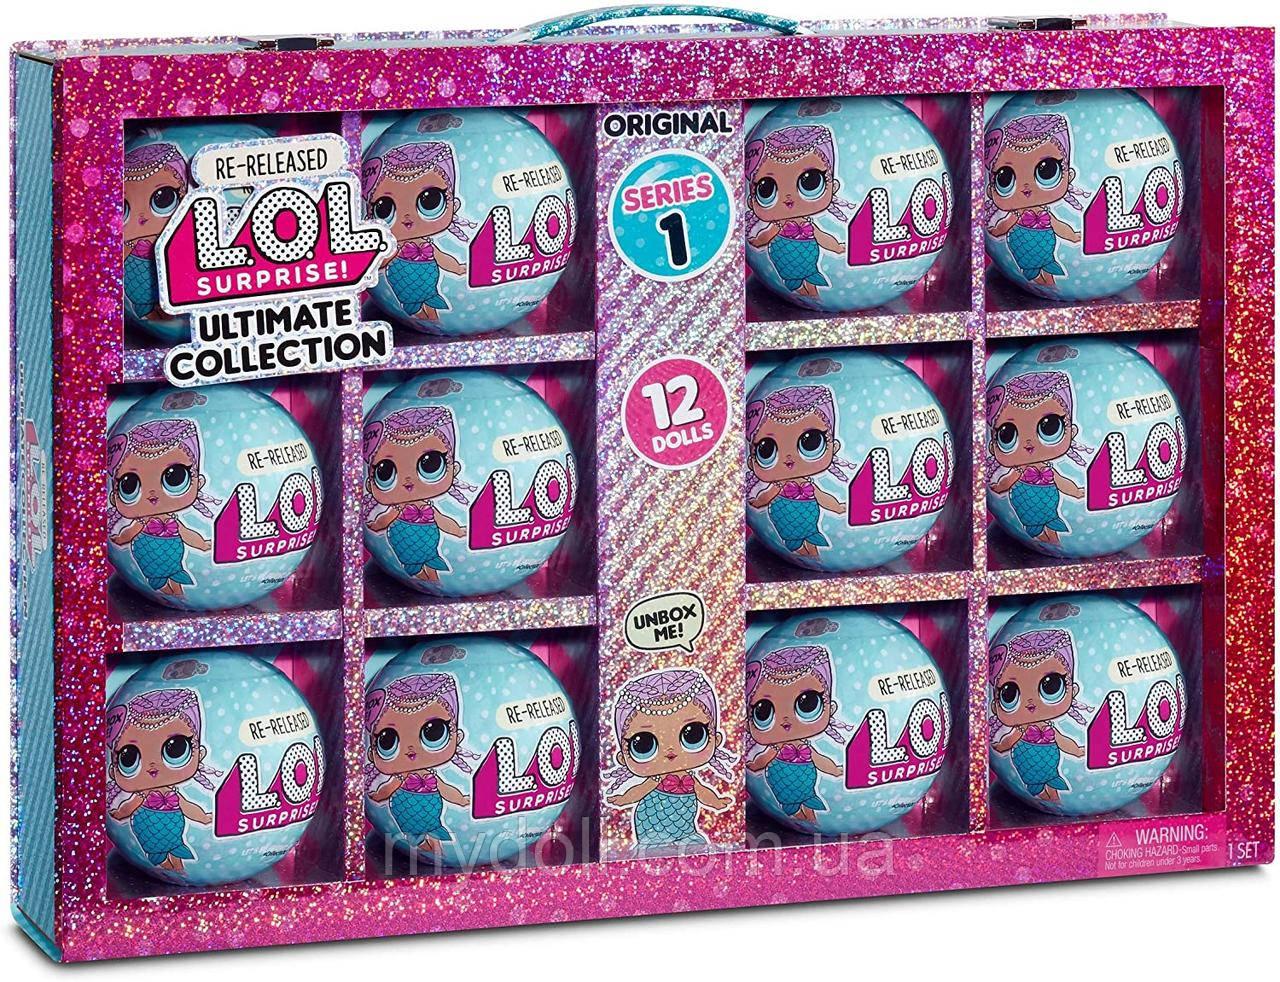 Величезний подарунковий набір ЛОЛ L. O. L. Surprise! Ultimate Collection Merbaby 571520